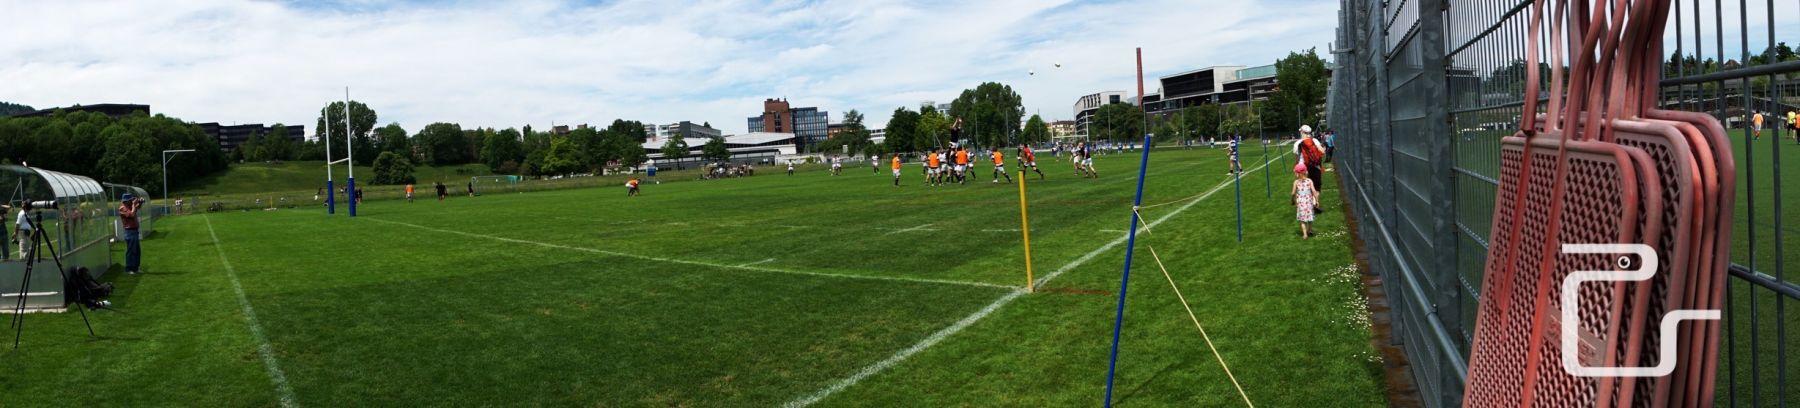 pls24.ch-rugby-gc-zuerich-lugano-NLA-2016-DSC20